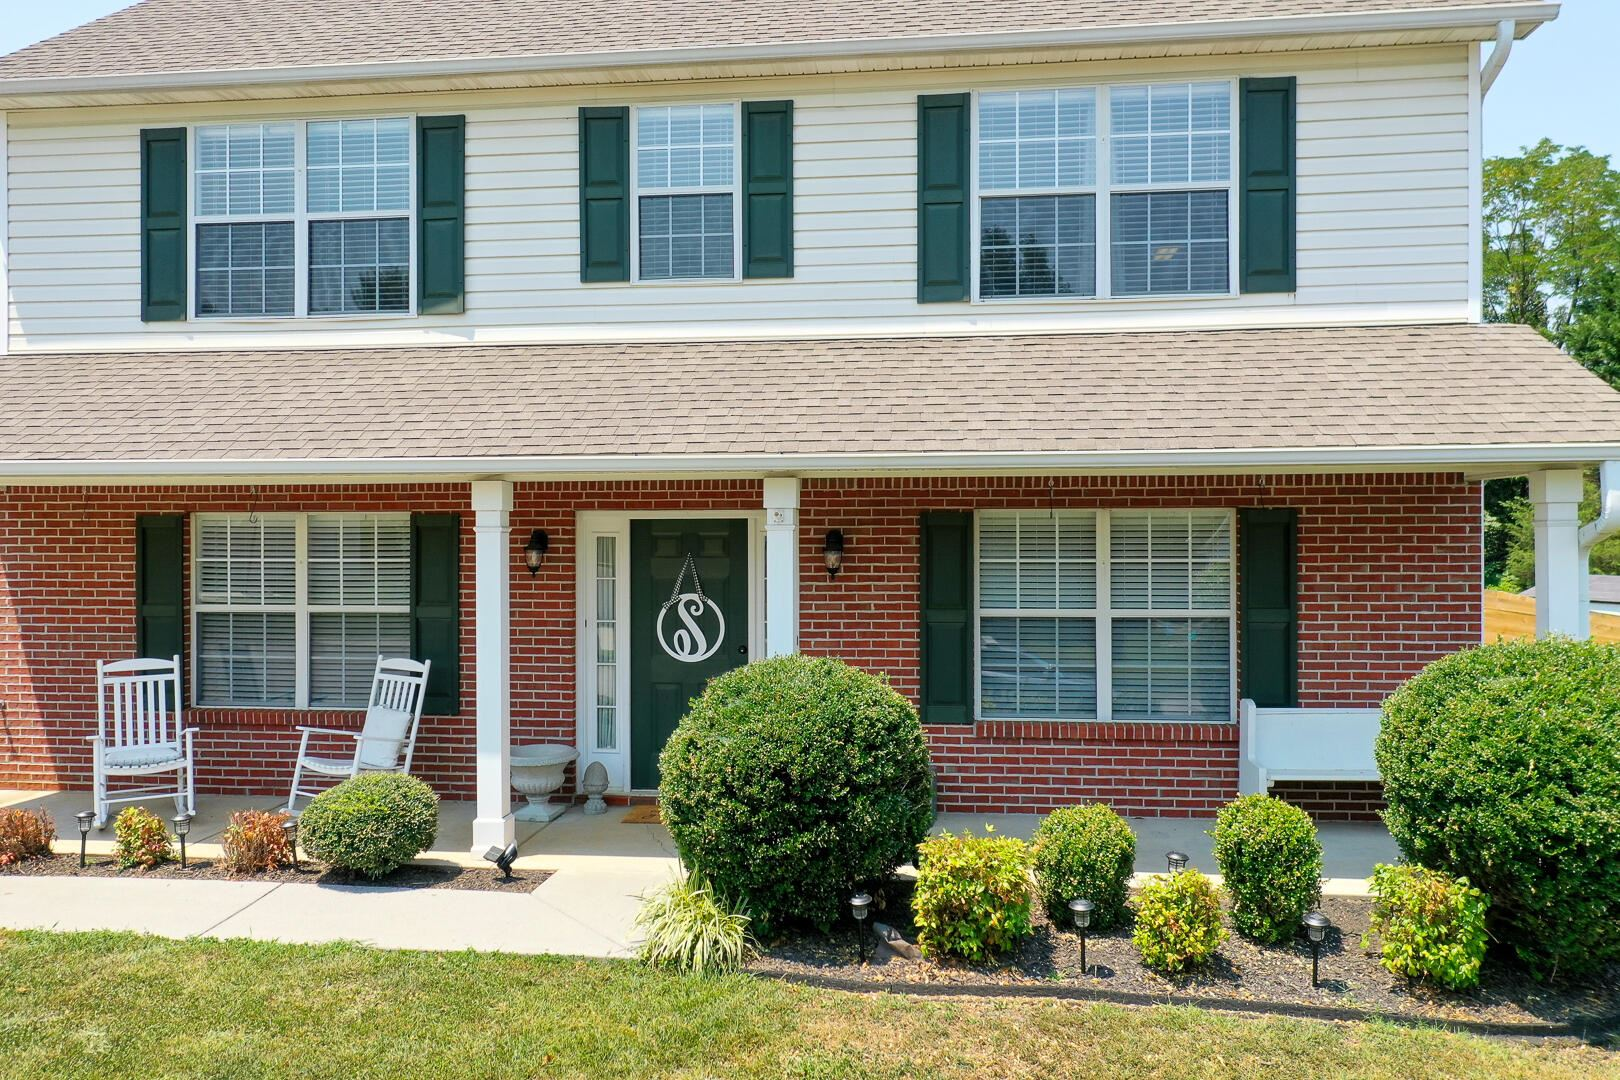 Photo of 1130 Avocet Lane, Knoxville, TN 37922 (MLS # 1162224)